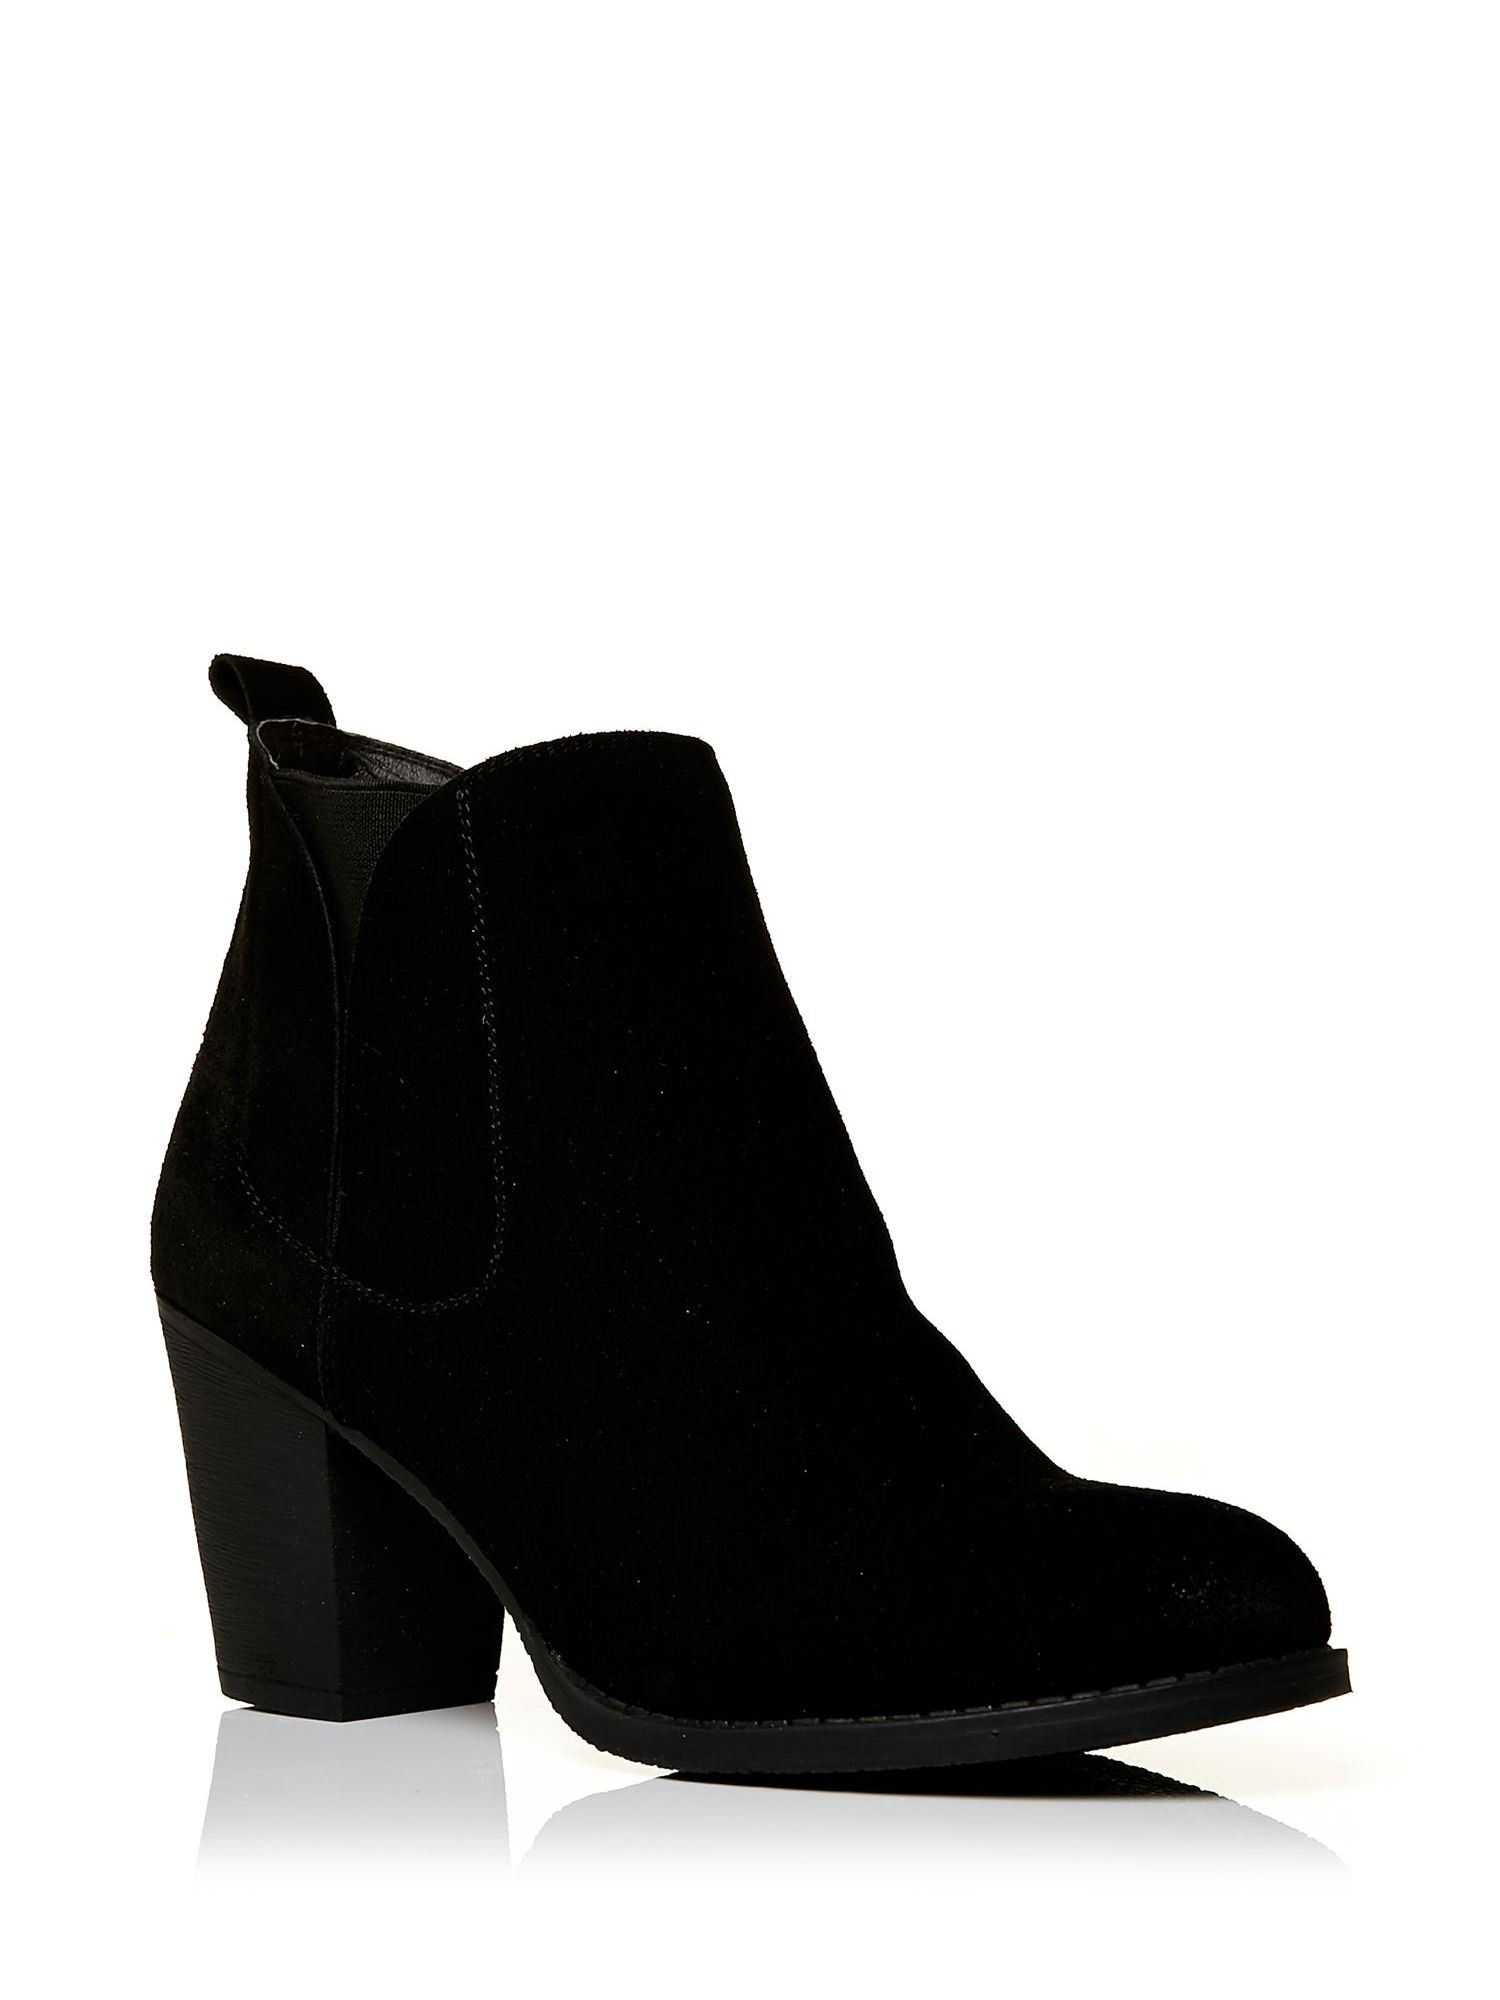 Moda In Pelle Benecias Medium Casual Short Boots in Black